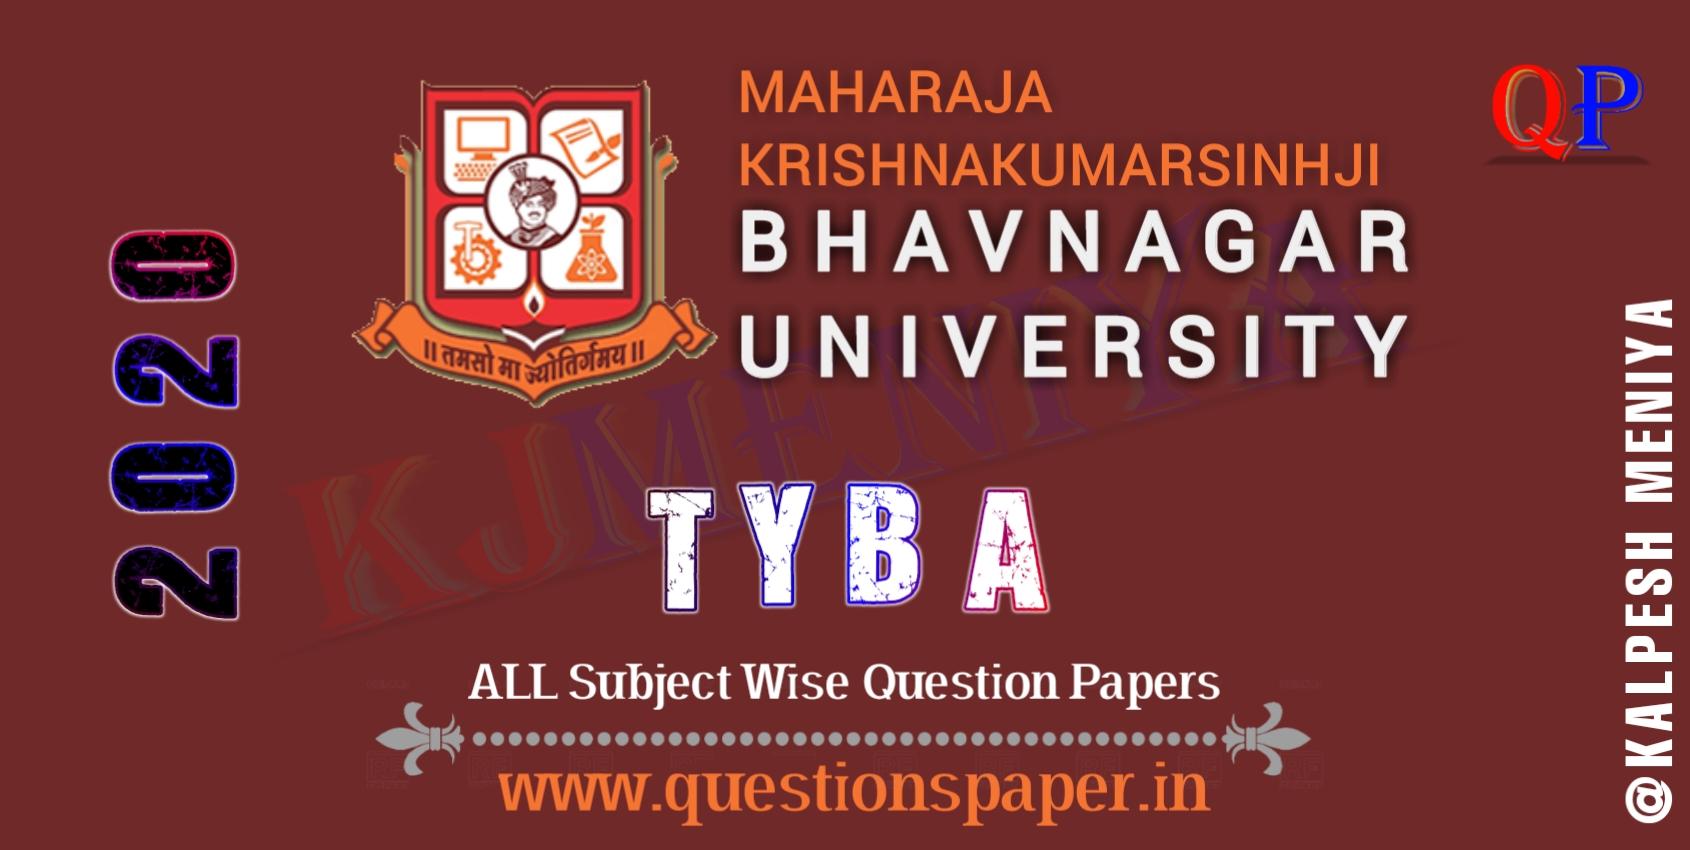 TYBA Bhavnagar University Question Papers 2020 – Maharaja Krishnakumarsinhji Bhavnagar University Previous Papers